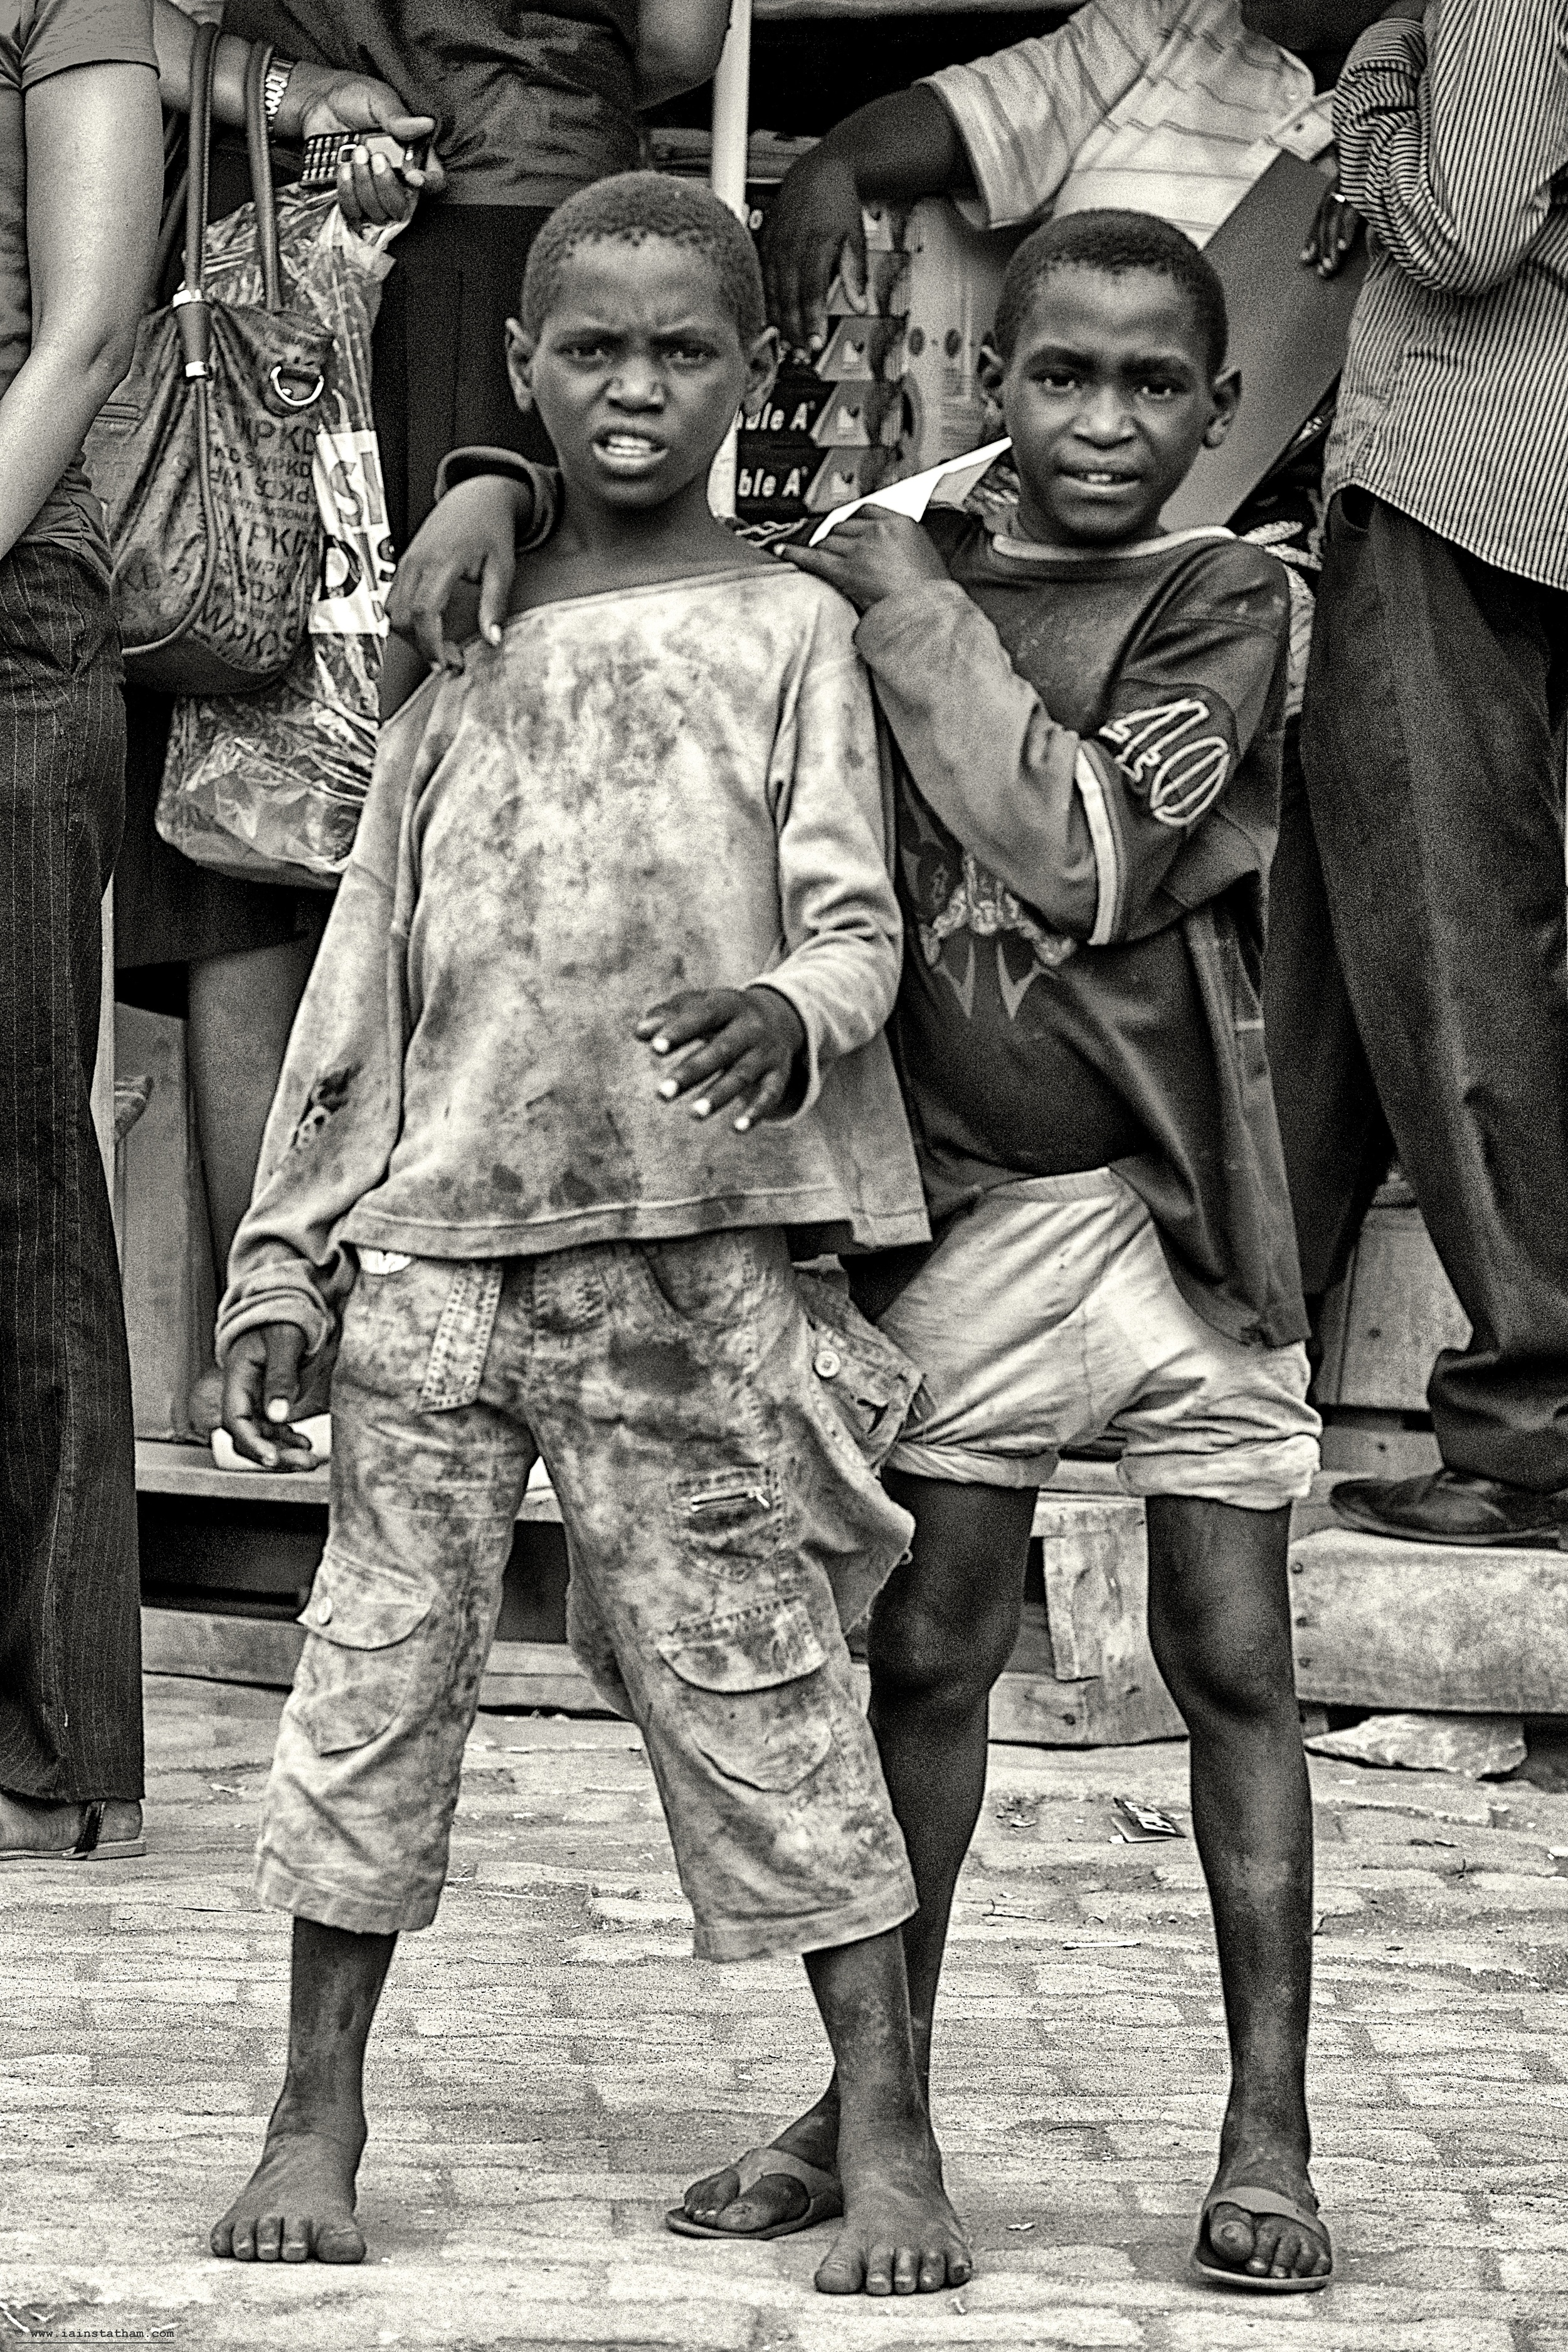 burundi bw feb 14 11.jpg